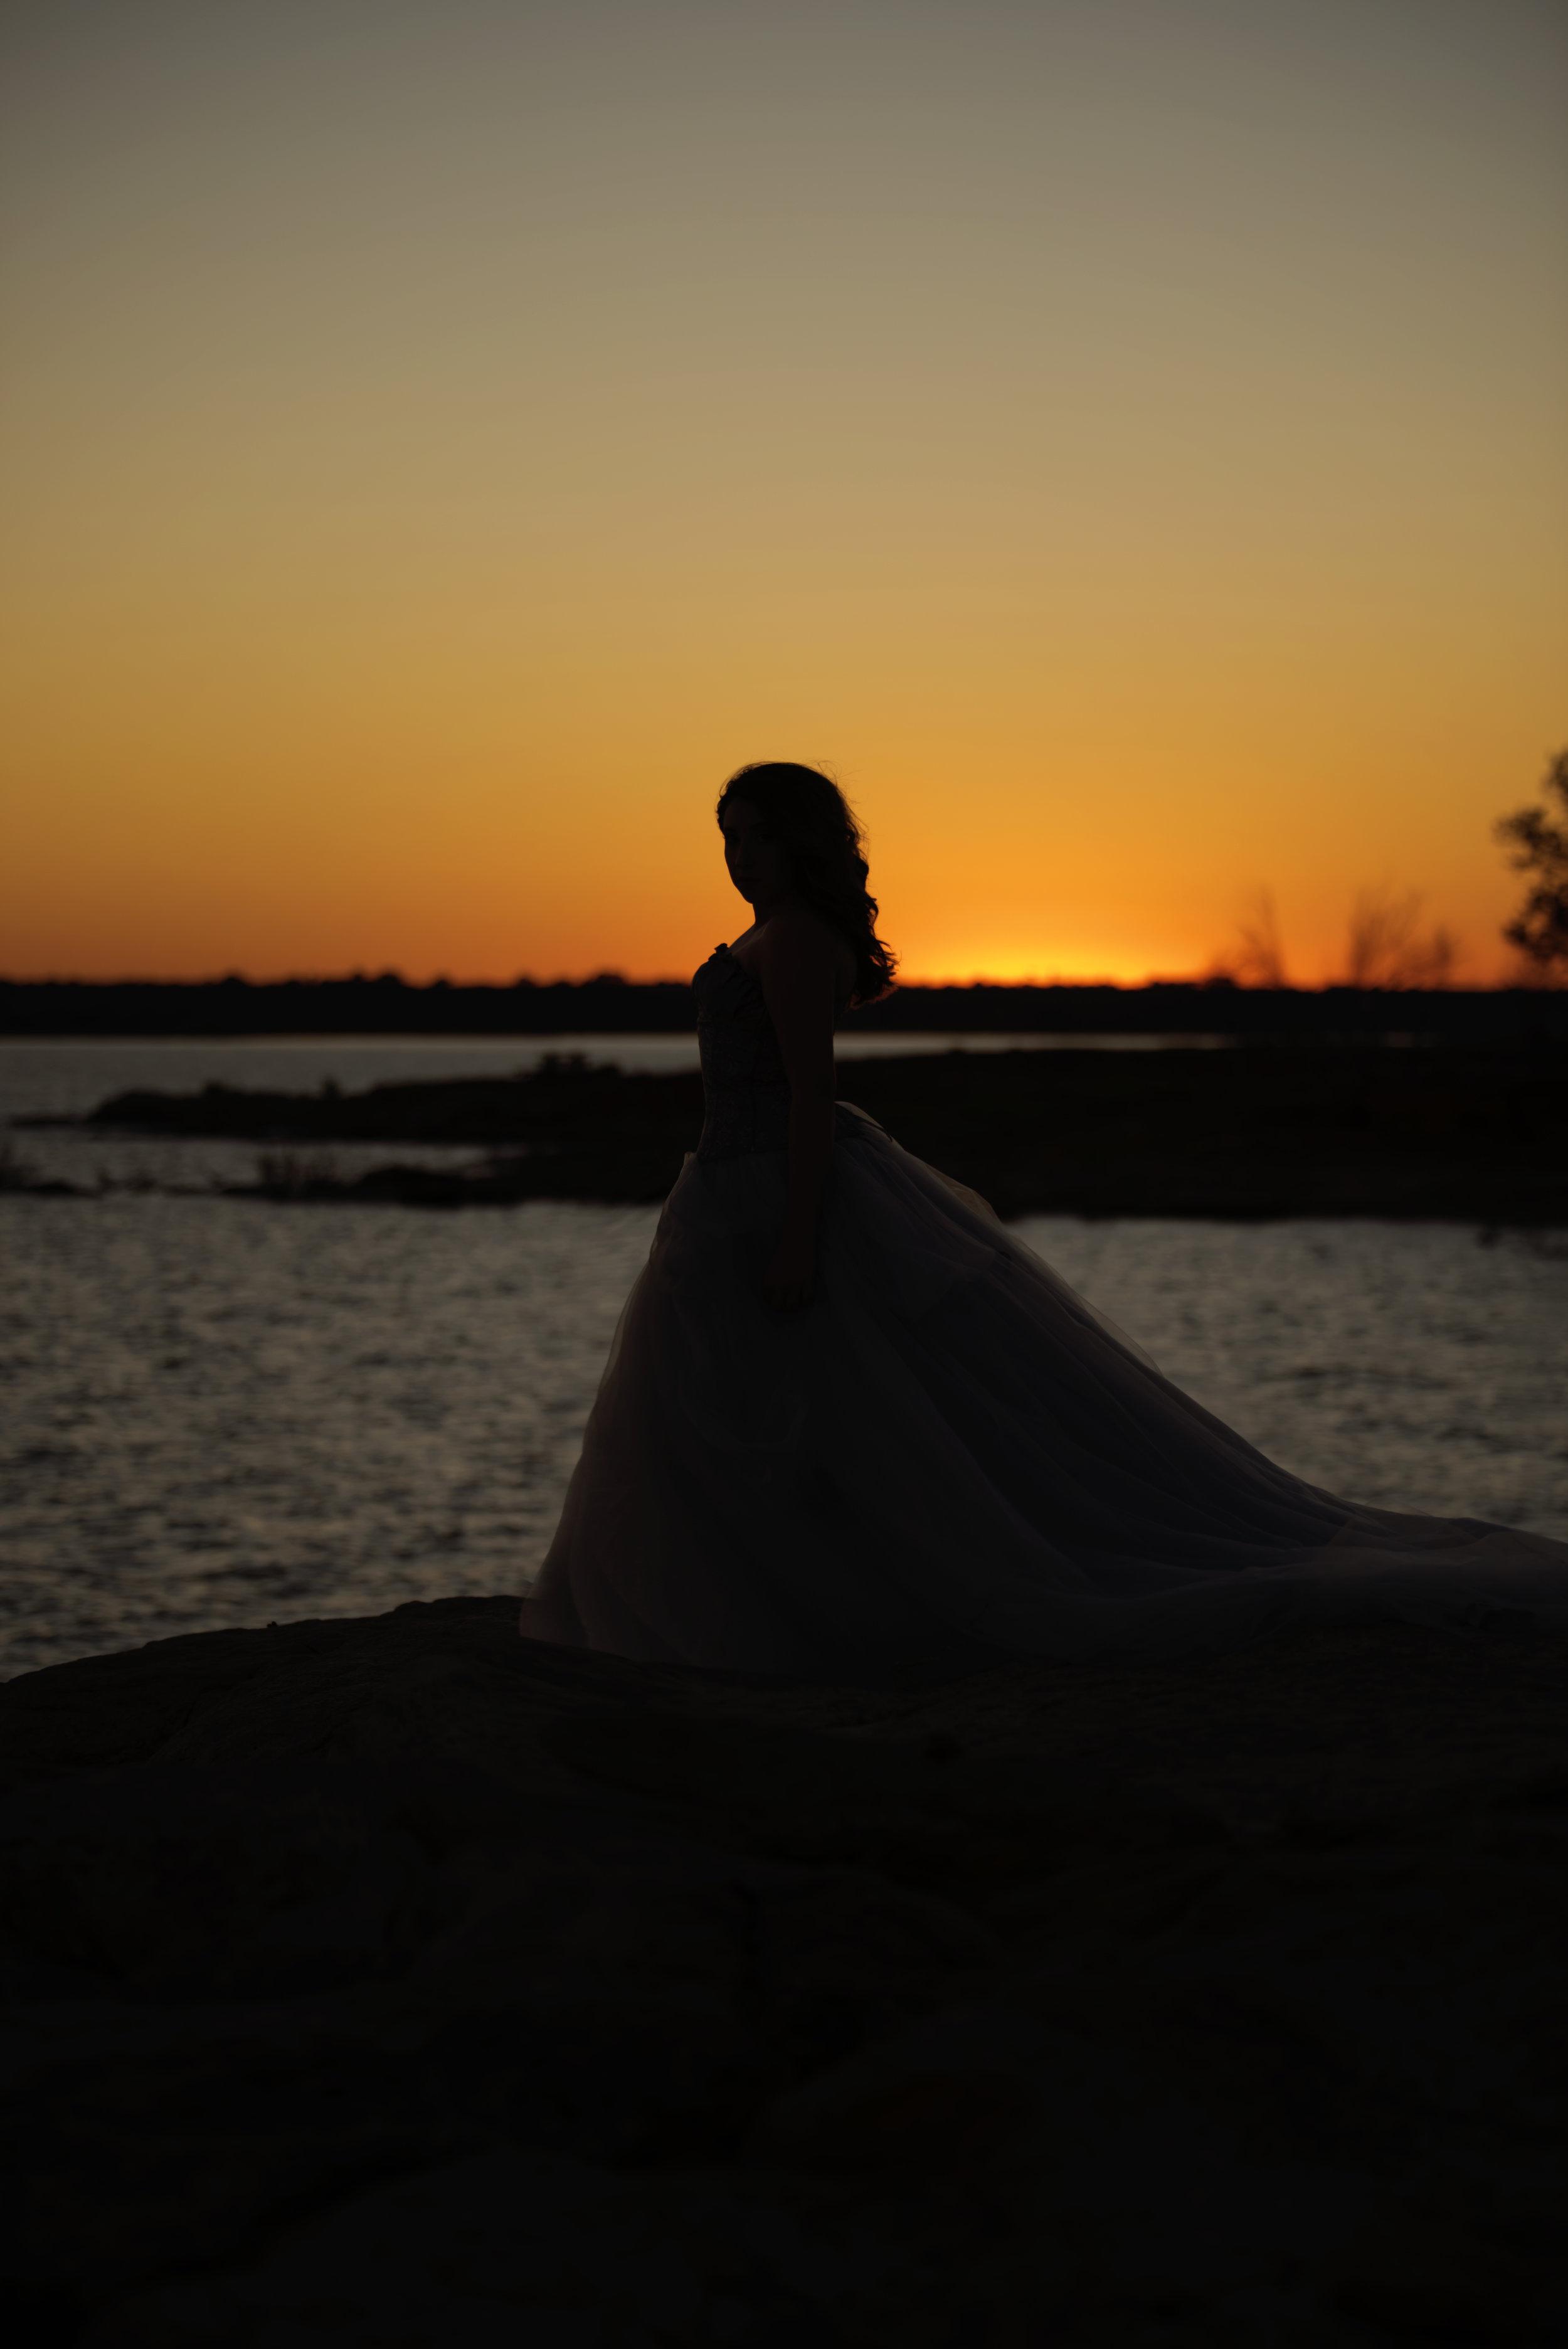 Reina-LeGrand-Photography-Photographer-Senior-azle-beauty-DFW-Dallas-Fort-Worth-Denton-Southlake-Colleyville-Grapevine-Roanoke-Keller-Westlake-Portrait-Portraiture-Photo-Session-k-argyle-2.jpg